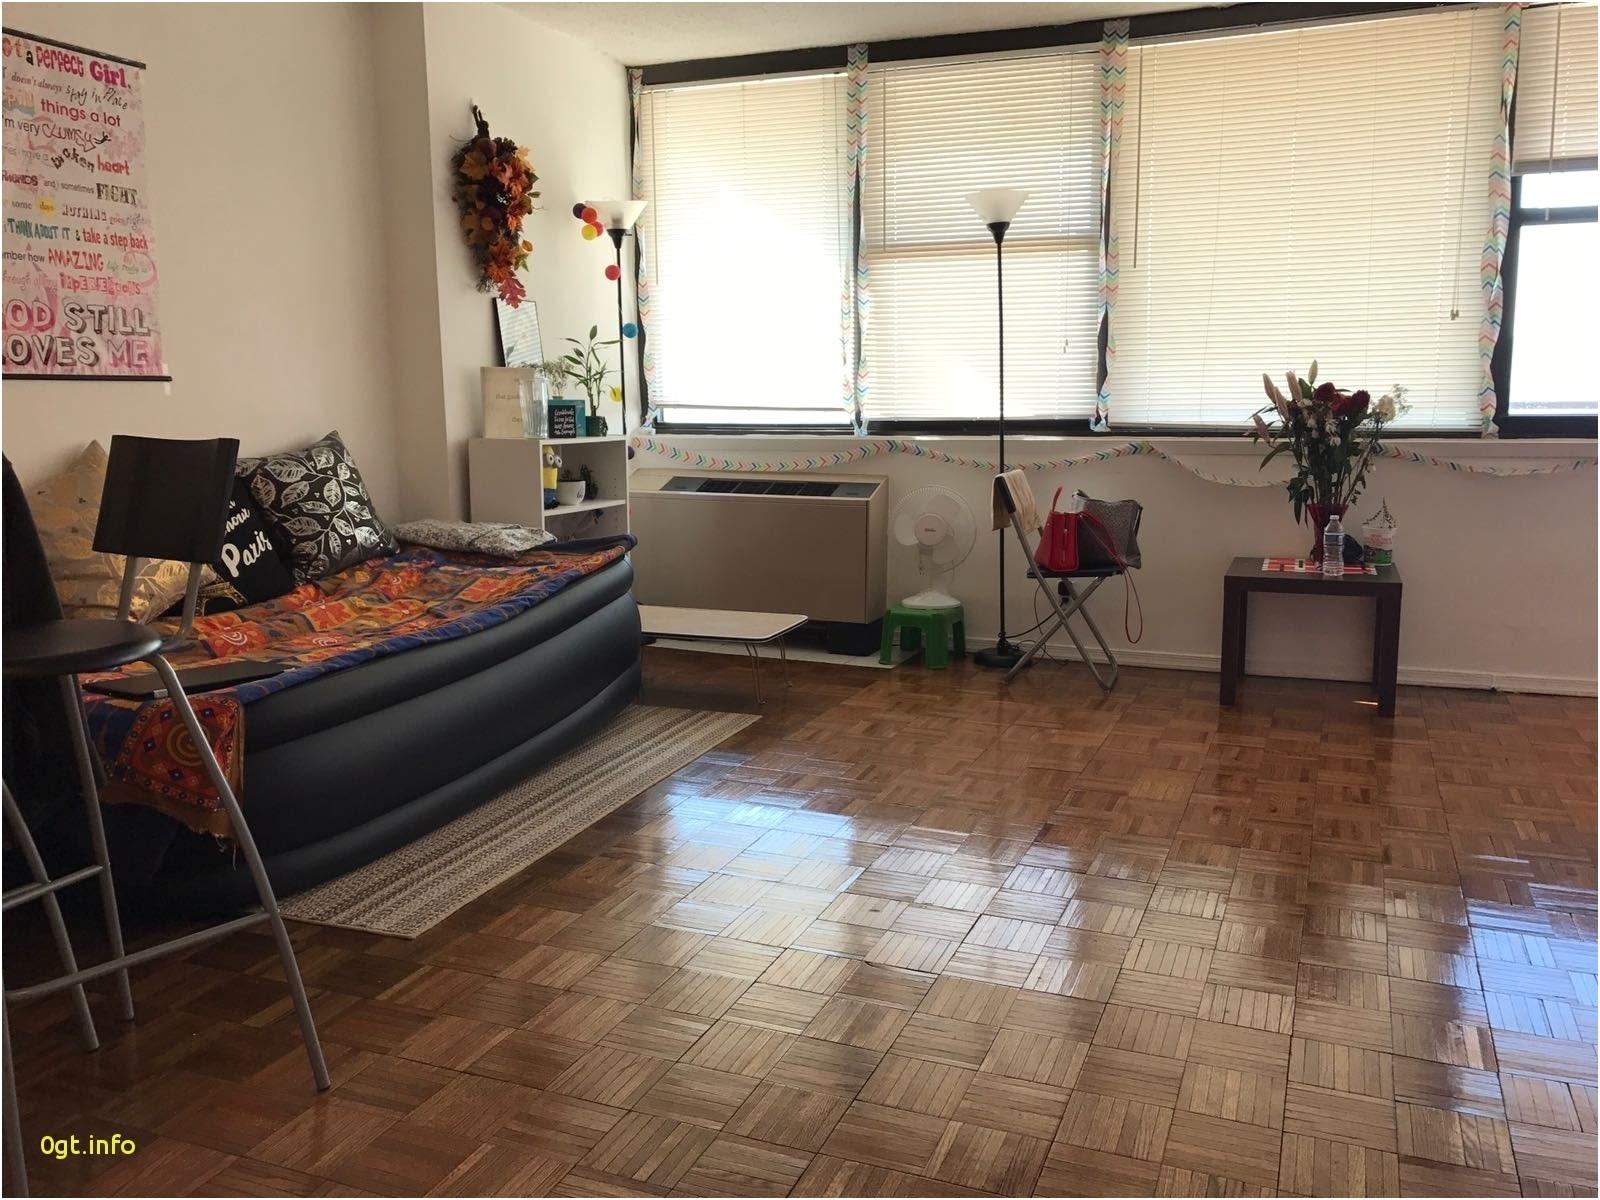 1 bedroom apartments for rent near me unique 1 bedroom apartment to awesome one bedroom apartment